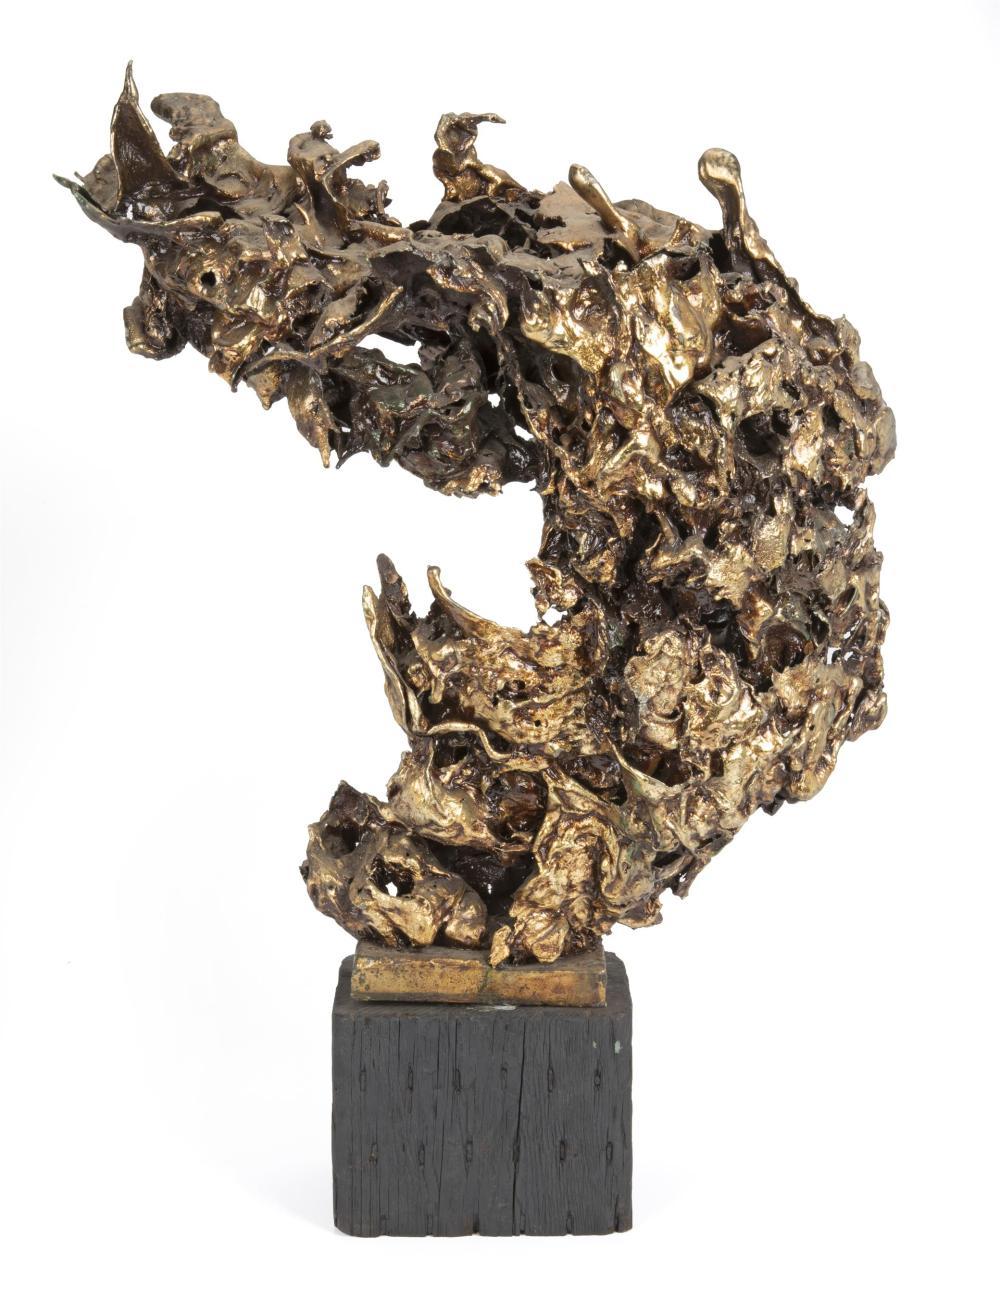 Sascha Brastoff, (1918-1993, American), Freeform sculpture, Mixed media on wood base, Overall: 30